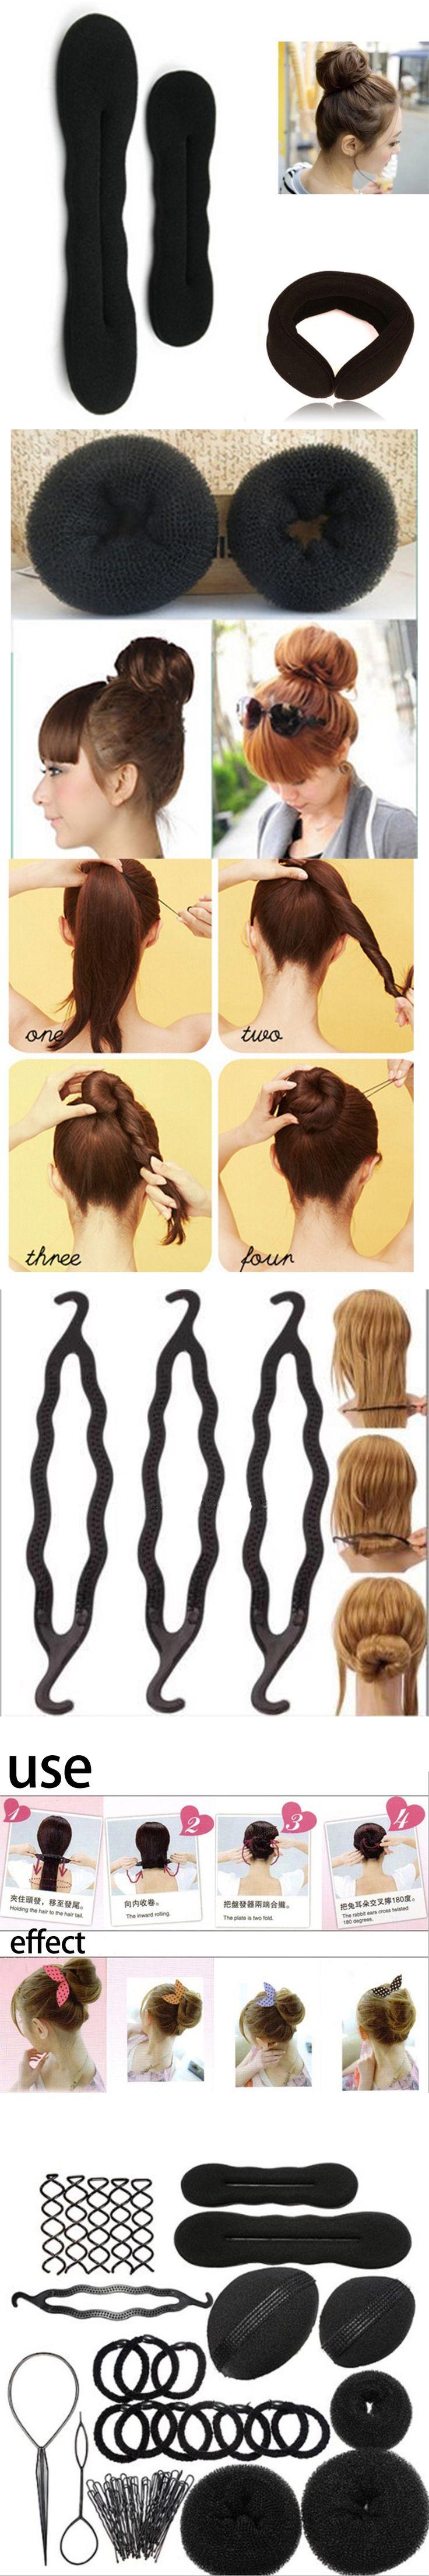 MAGIC CURLER 1 full Set Braiding hair accessories Women's Wig Curling Hair styling sponge tools Head For hairstyles Braid tool